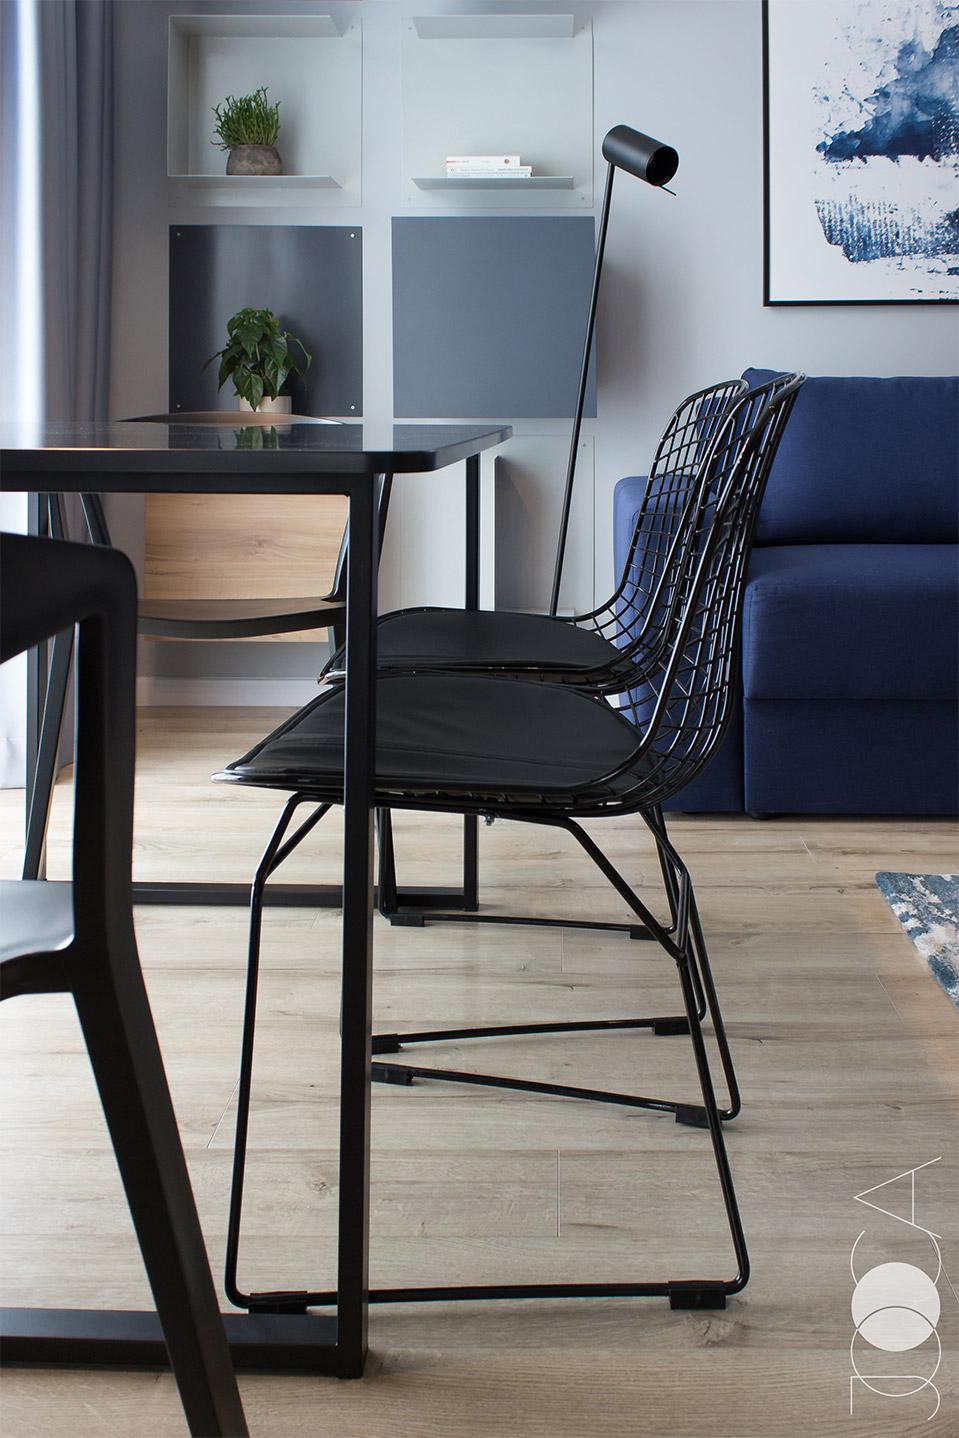 Negrul predomina in aceasta amenajare. Metalul se regaseste la scaune si la cadrele mesei.